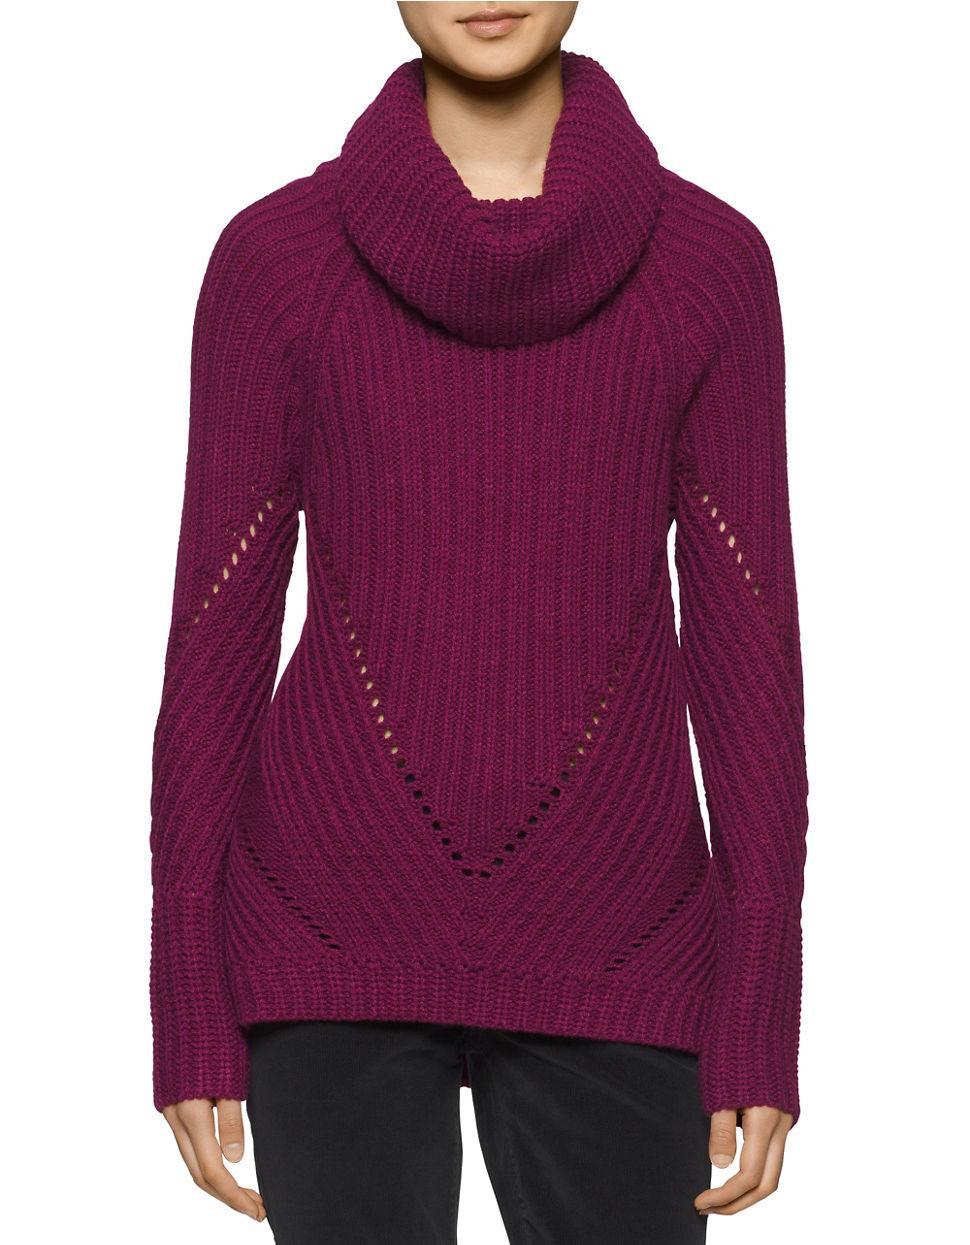 calvin klein long sleeve turtleneck pullover in purple lyst. Black Bedroom Furniture Sets. Home Design Ideas